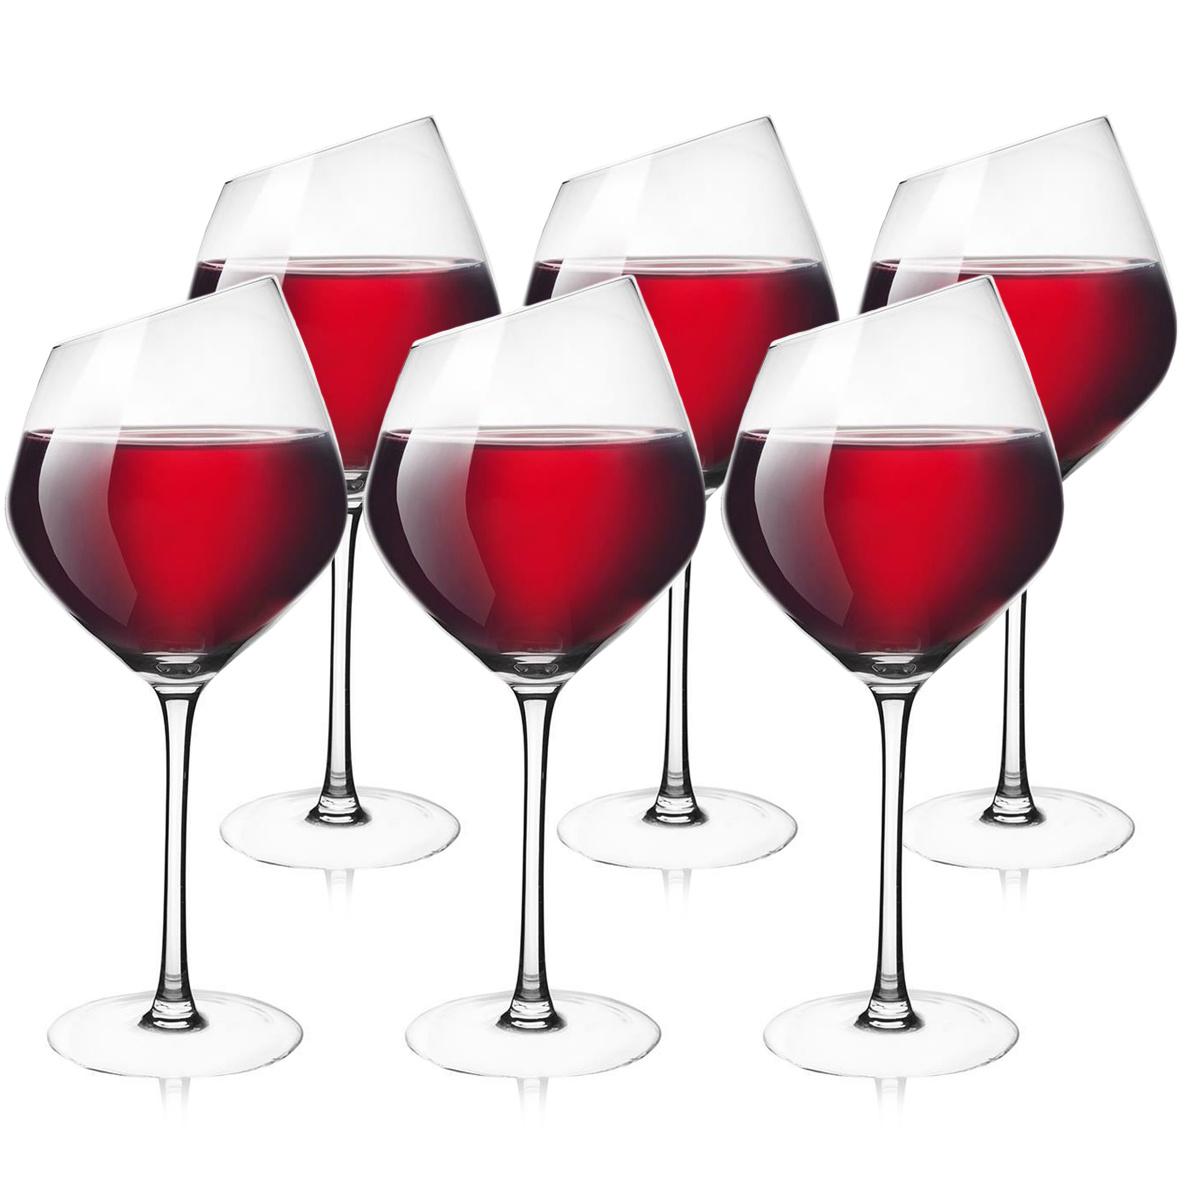 Orion Sklenice na červené víno Exclusive, 6 ks